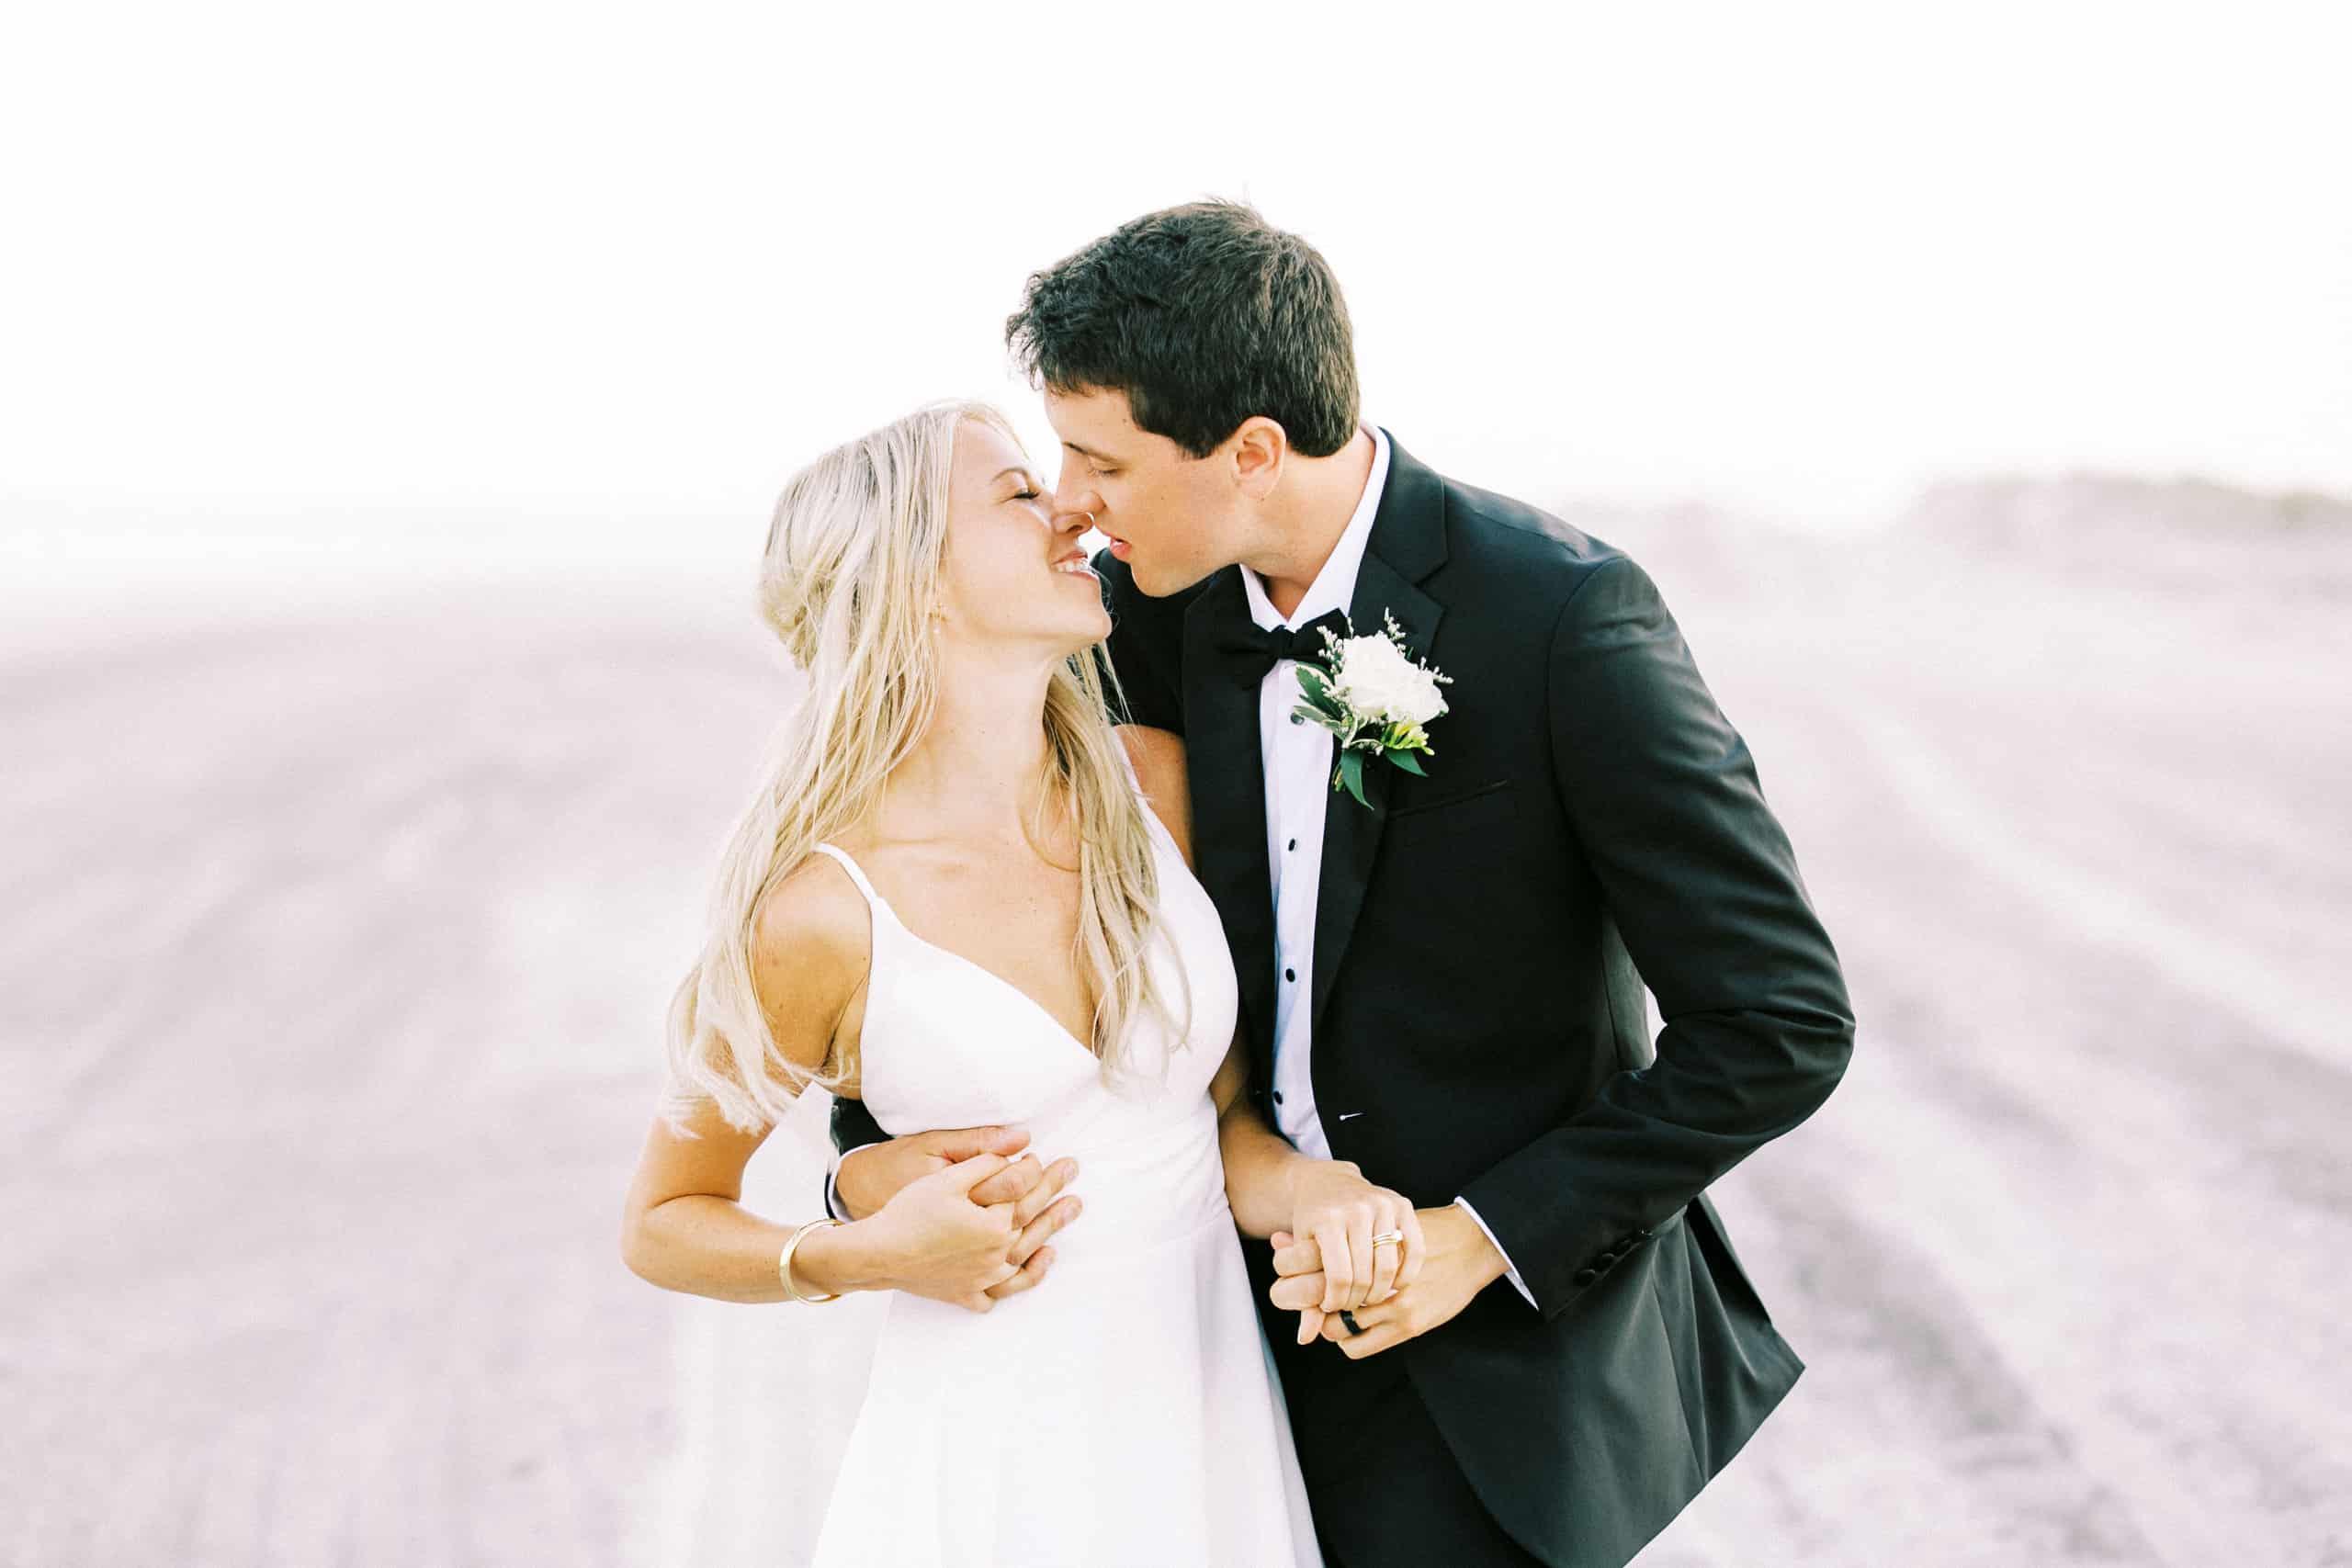 Weddings at the Shore Avalon